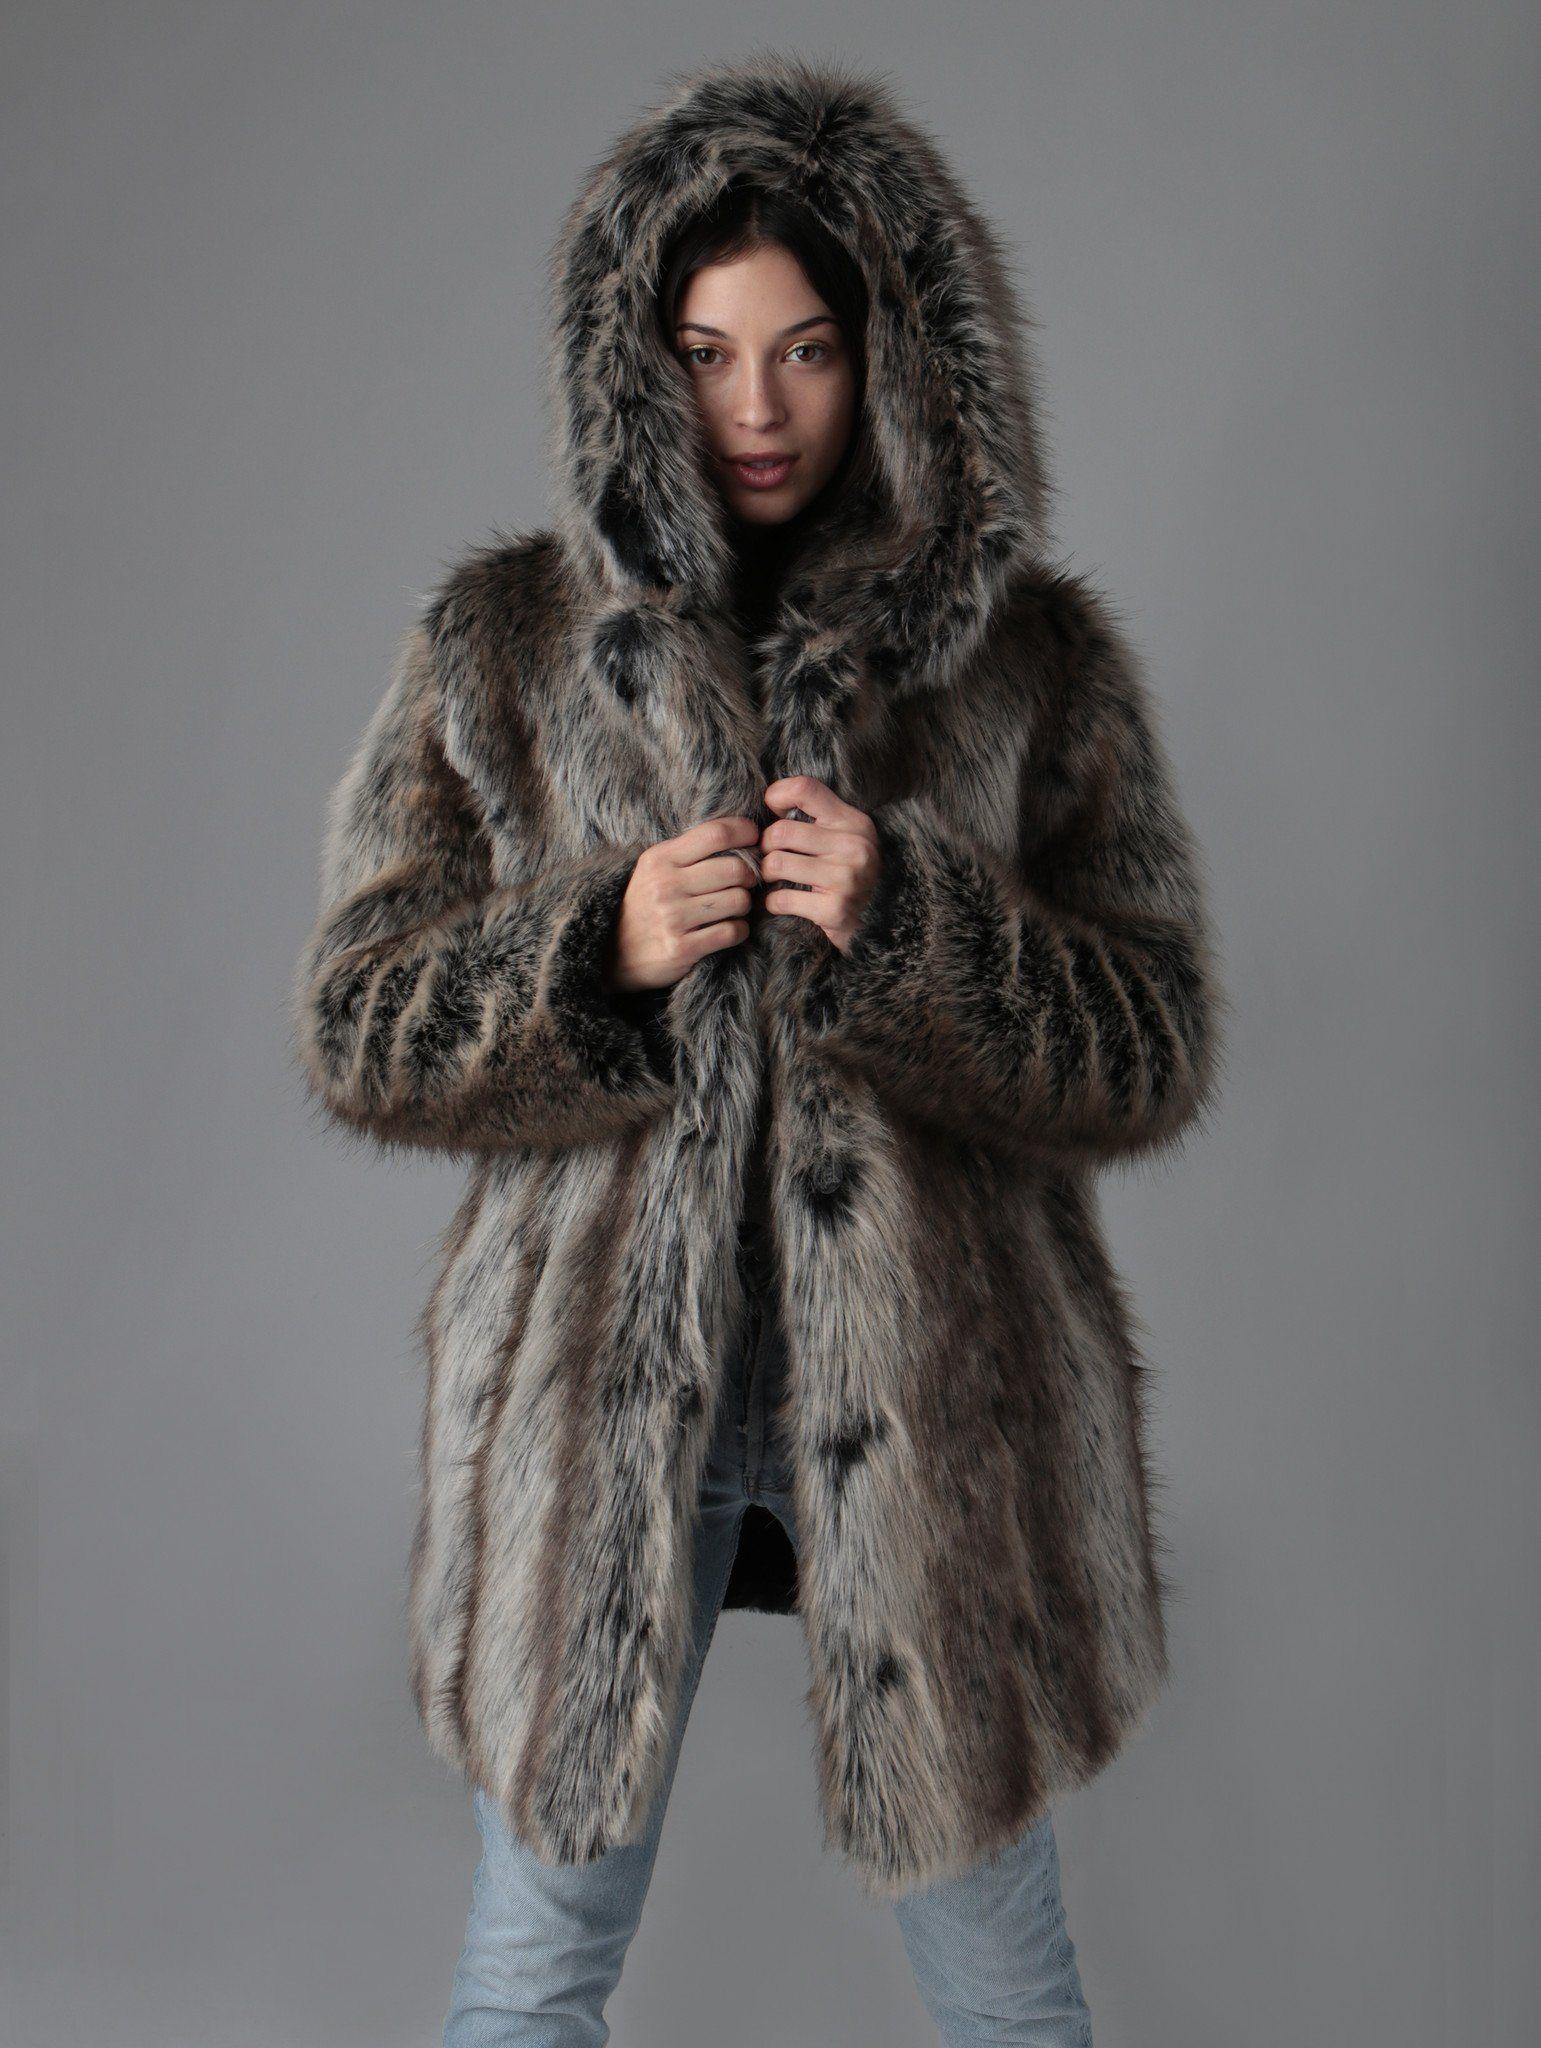 dcd2c3befa Hooded Grey Wolf Faux Fur Coat | Products | Faux fur, Coat, Fur